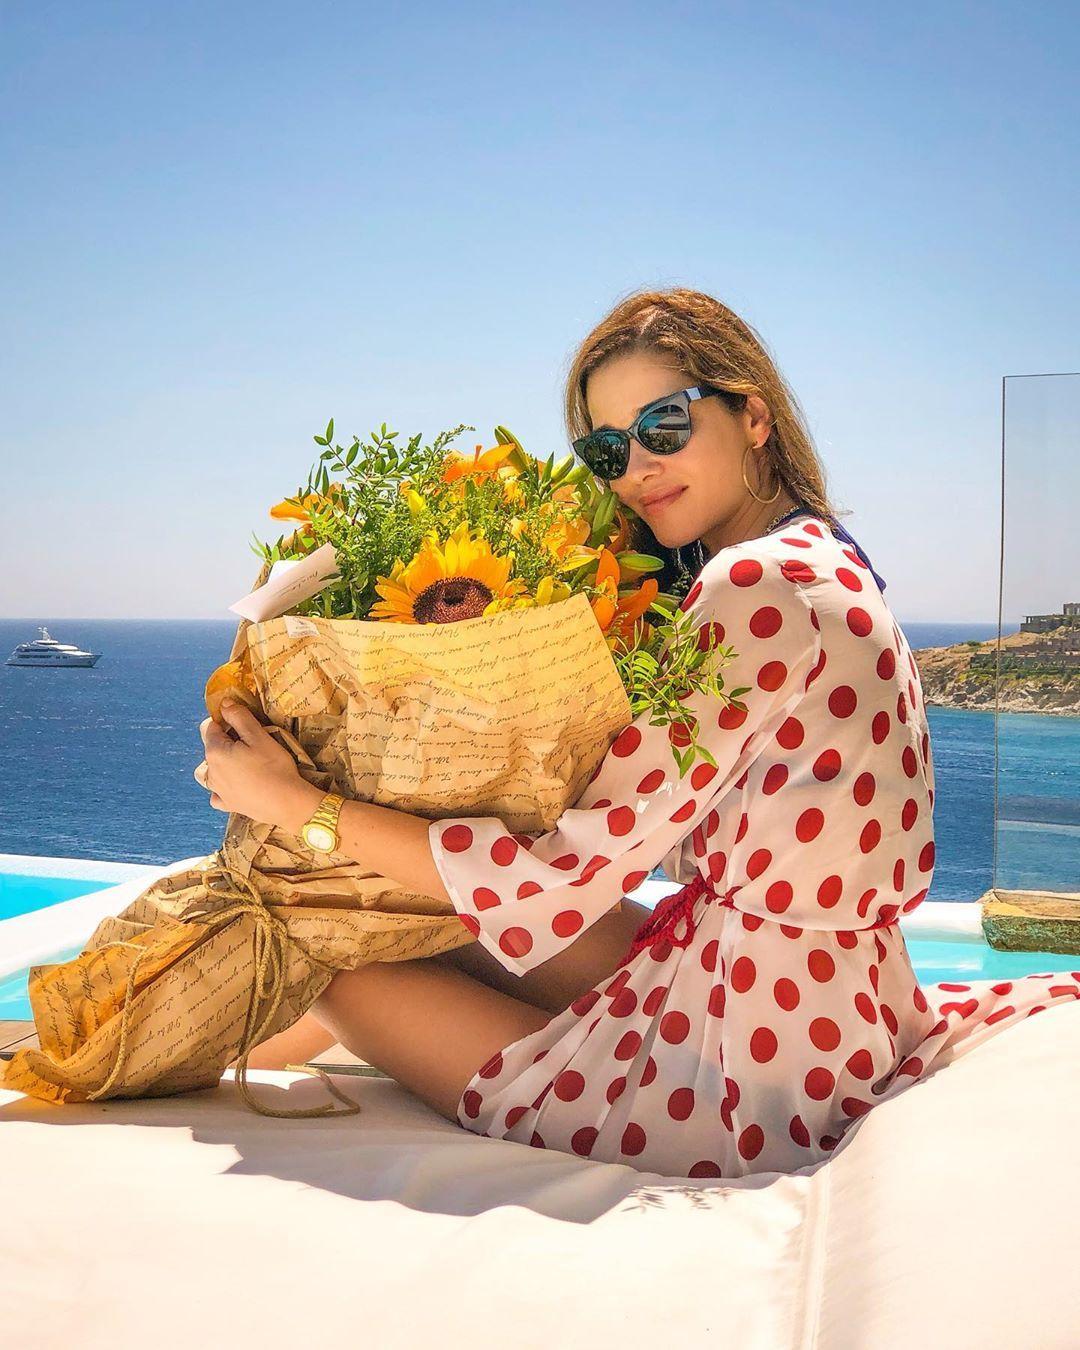 , Ana Beatriz Barros - Κarim El Chiaty: Mykonos for wedding anniversary three years!!